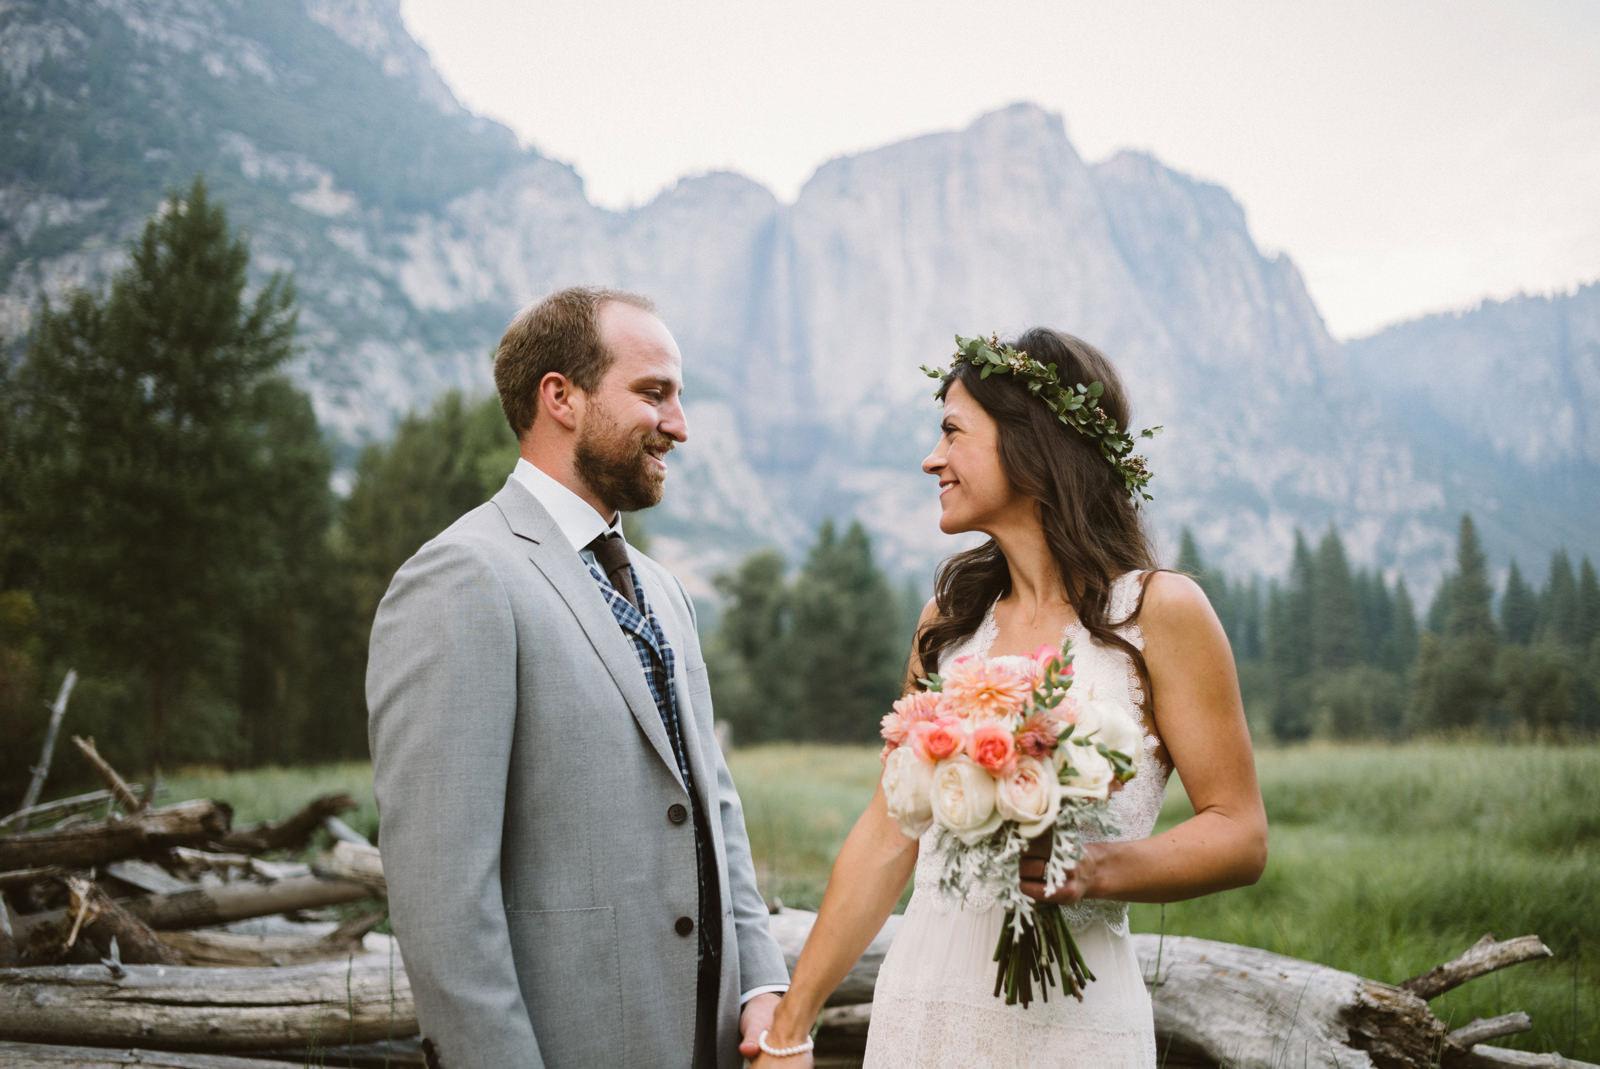 yosemite-intimate-wedding-083 YOSEMITE INTIMATE WEDDING